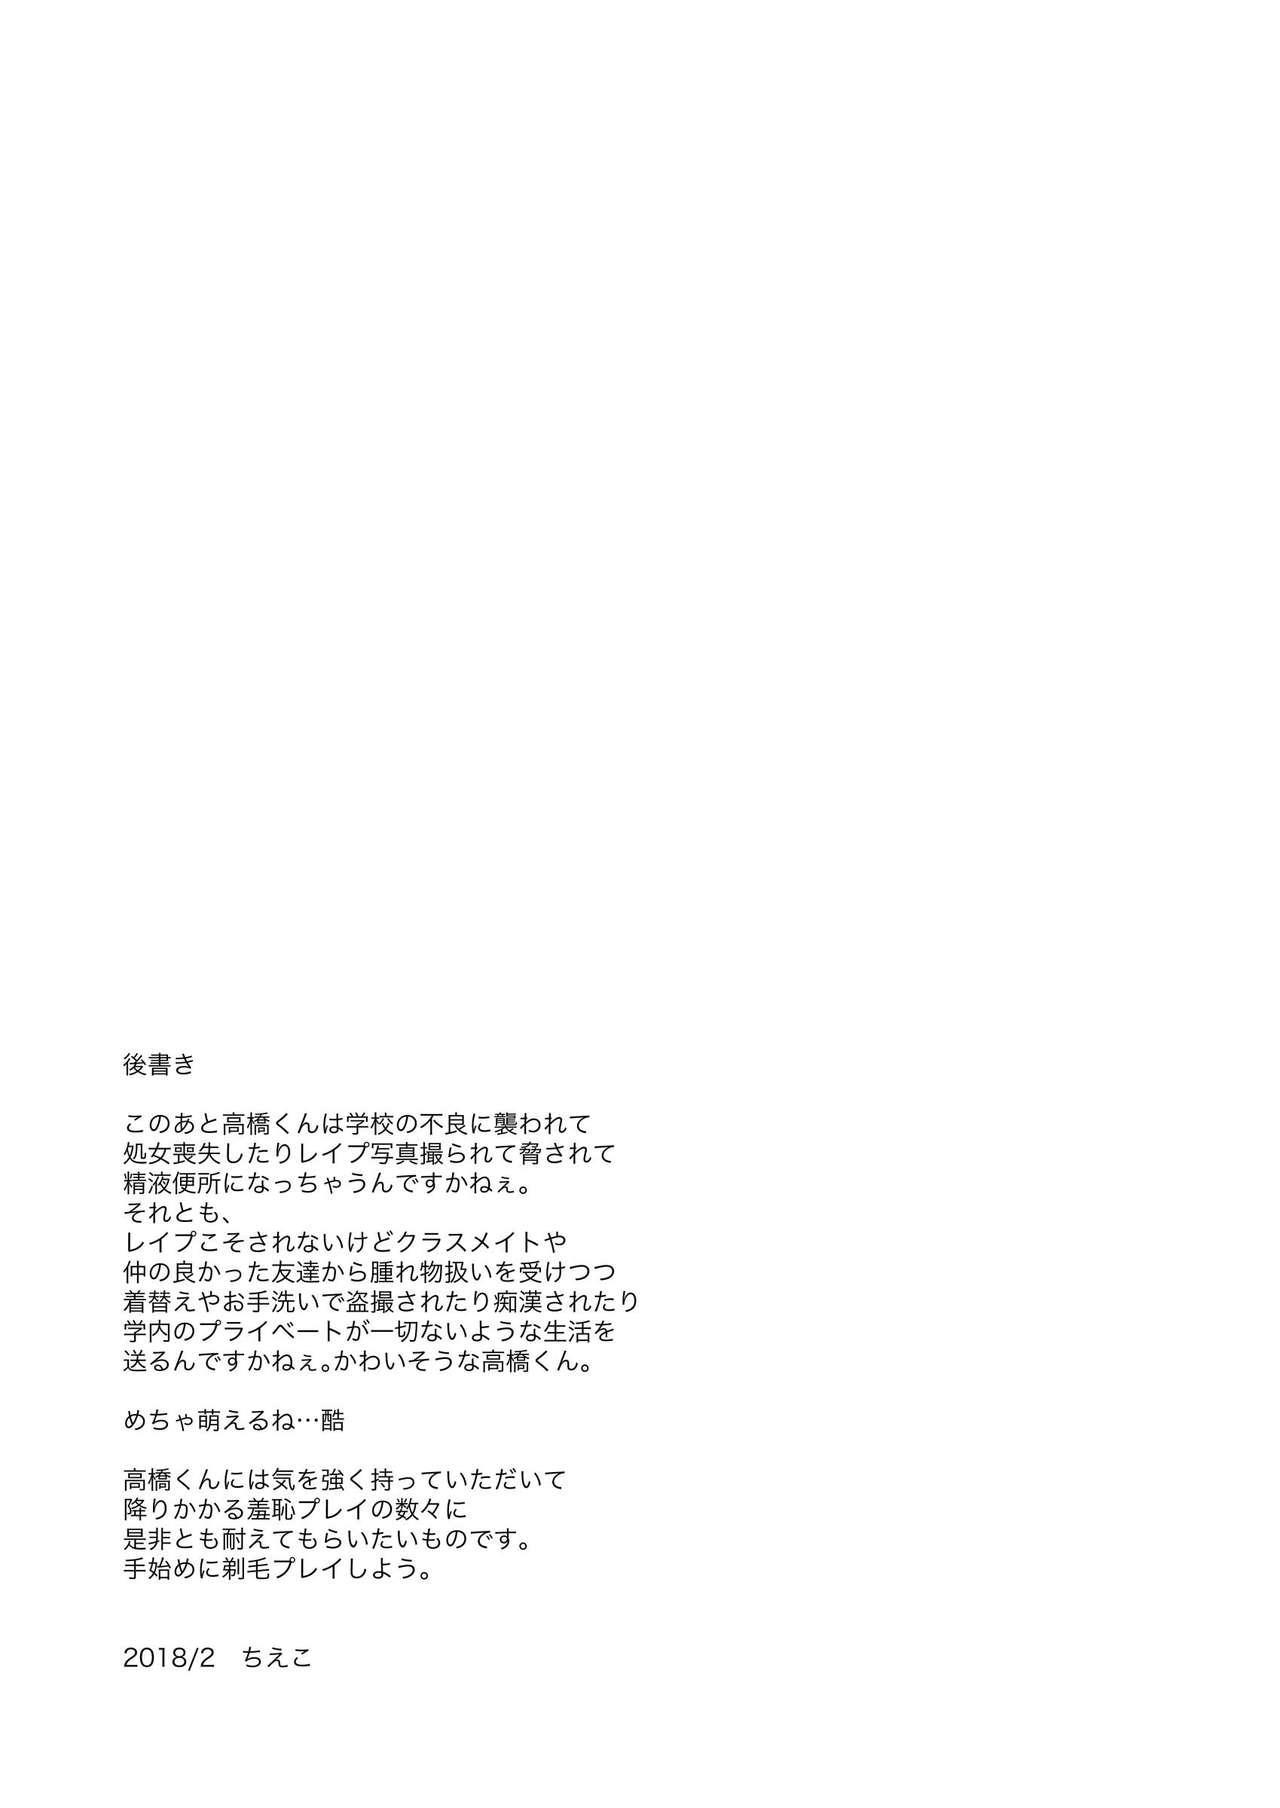 Bijutsu Jugyou Dessin Model 13